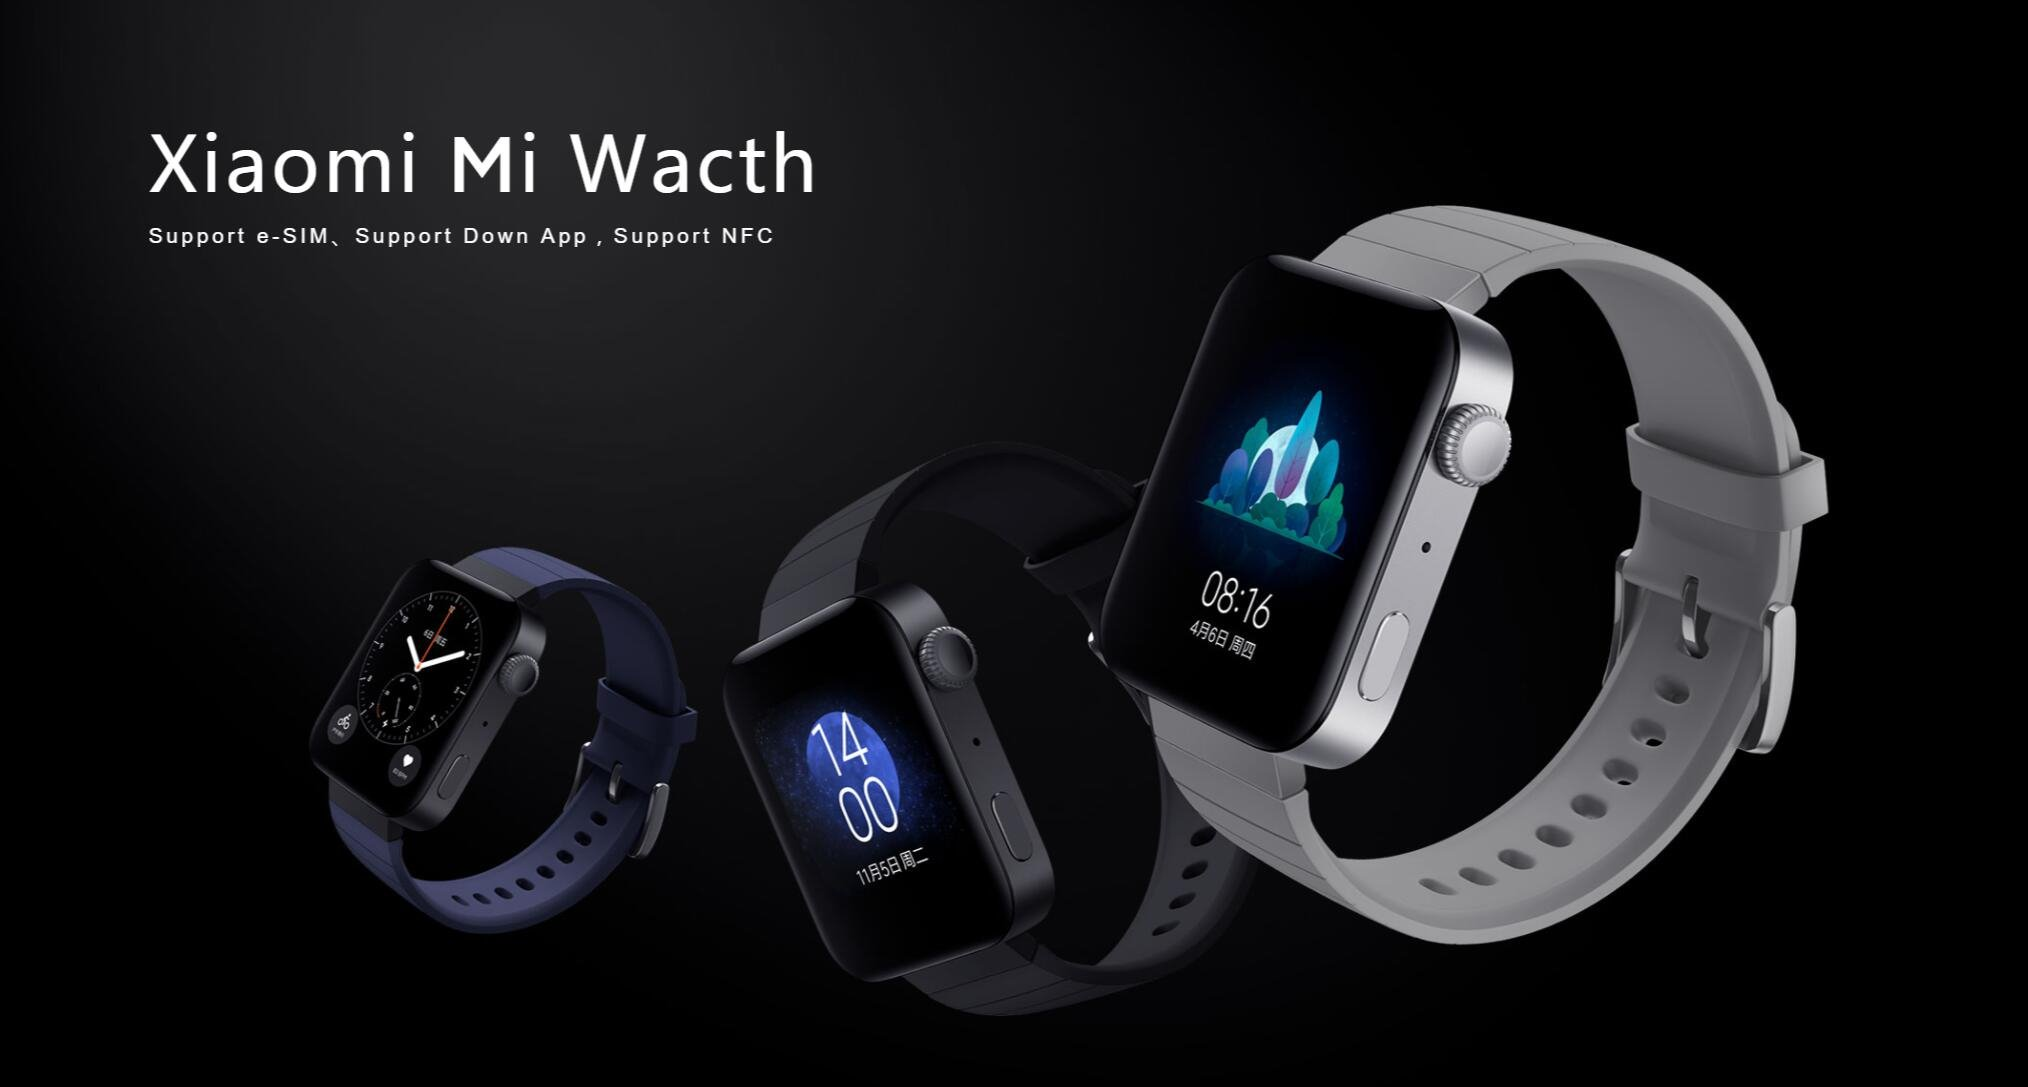 mi-watch-01.jpg